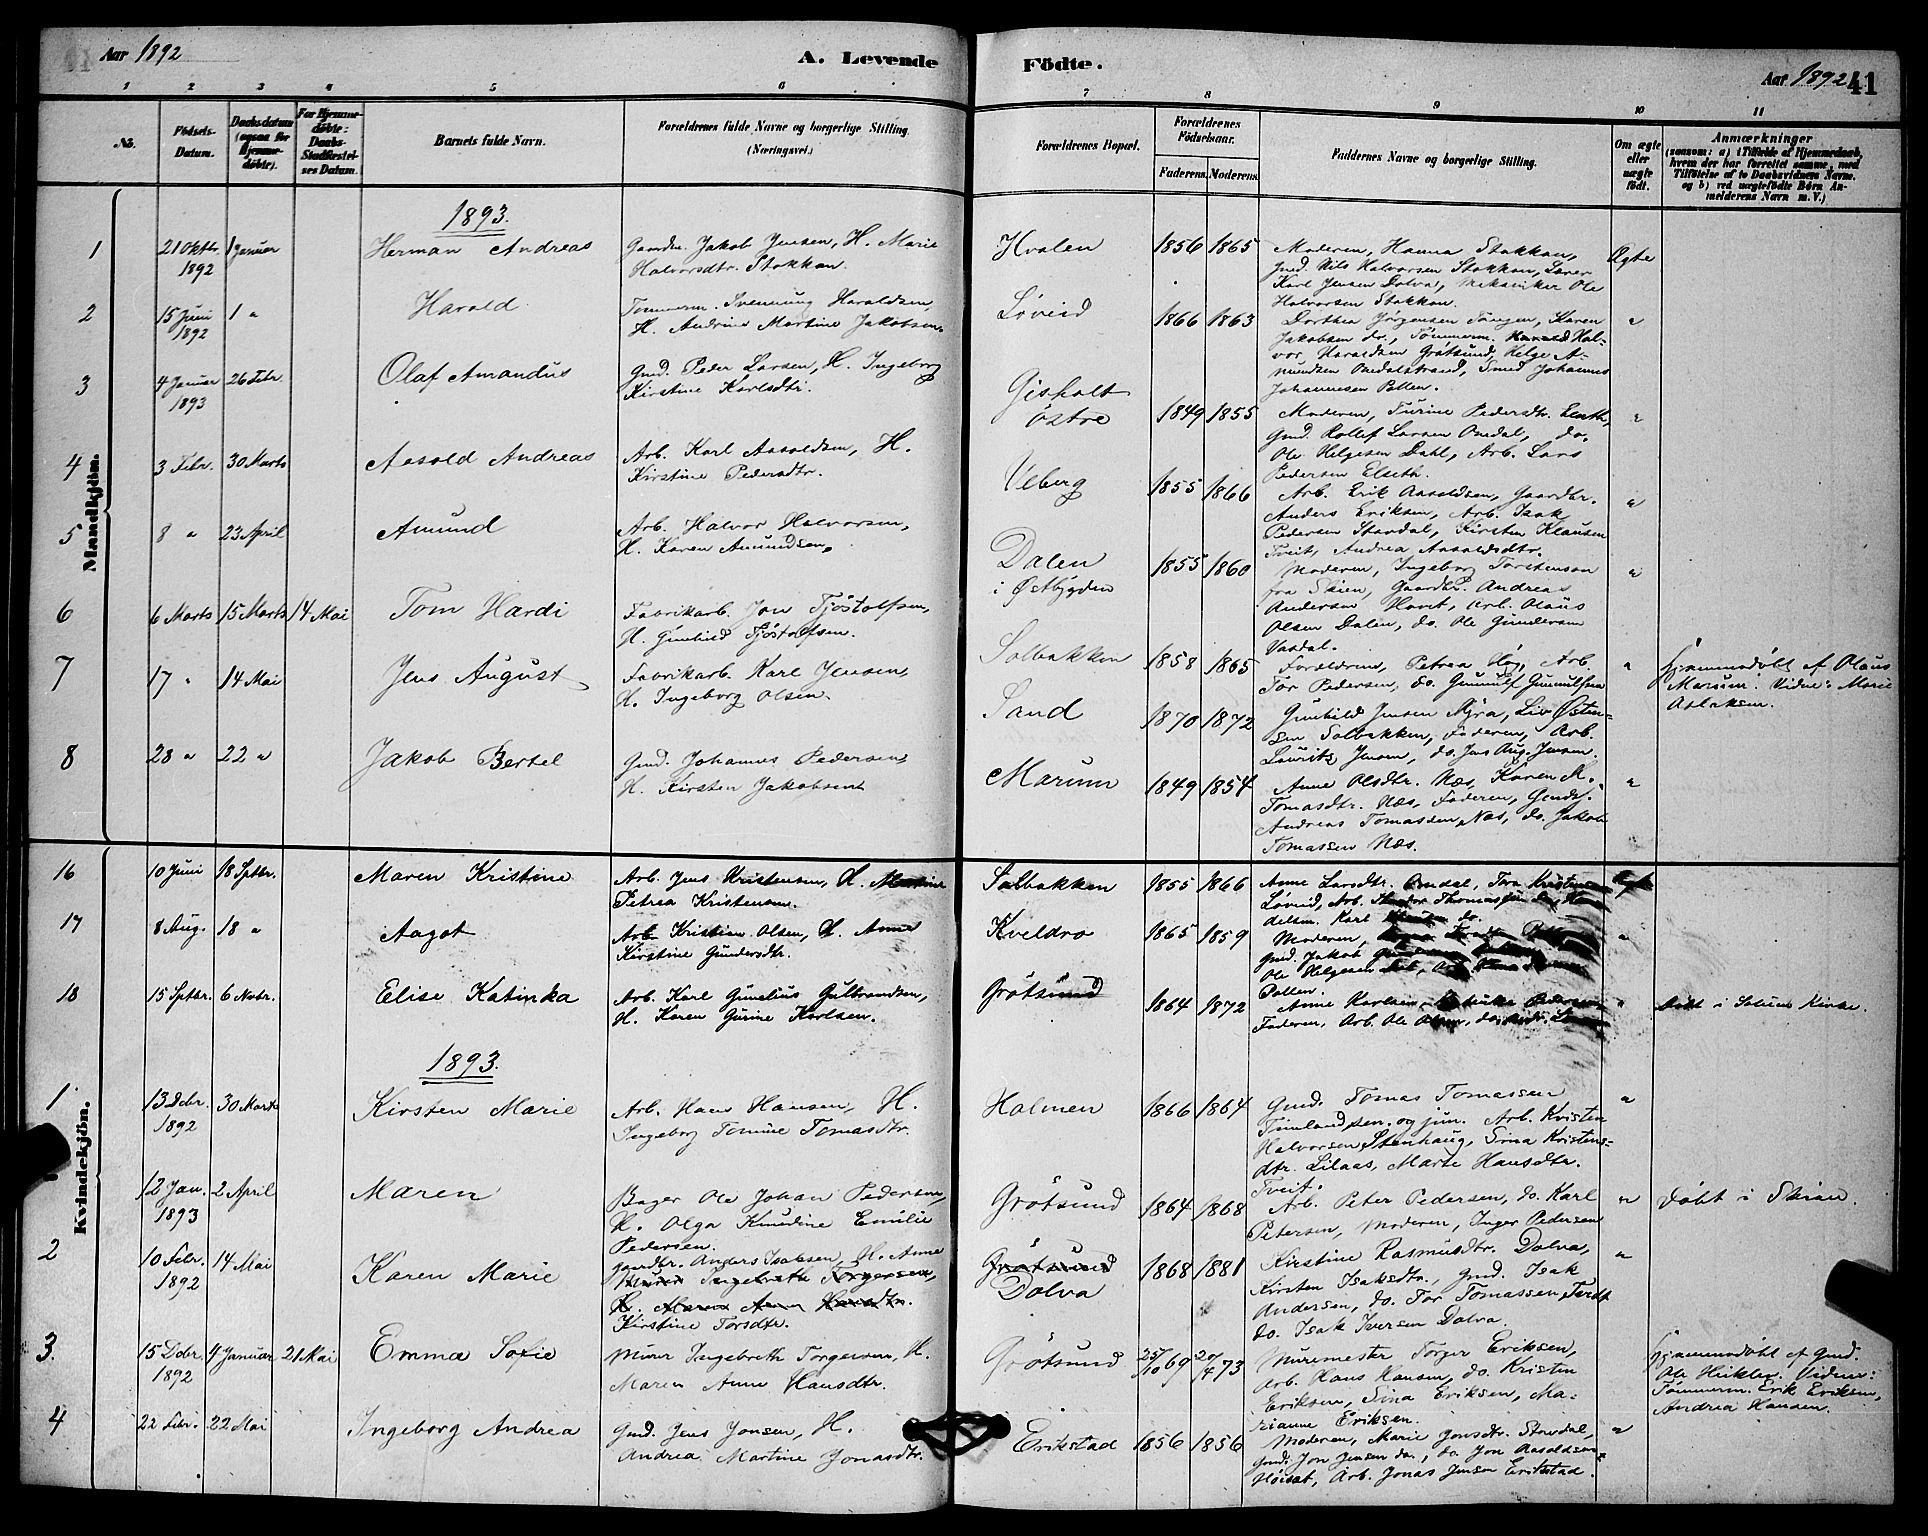 SAKO, Solum kirkebøker, G/Gb/L0003: Klokkerbok nr. II 3, 1880-1898, s. 41